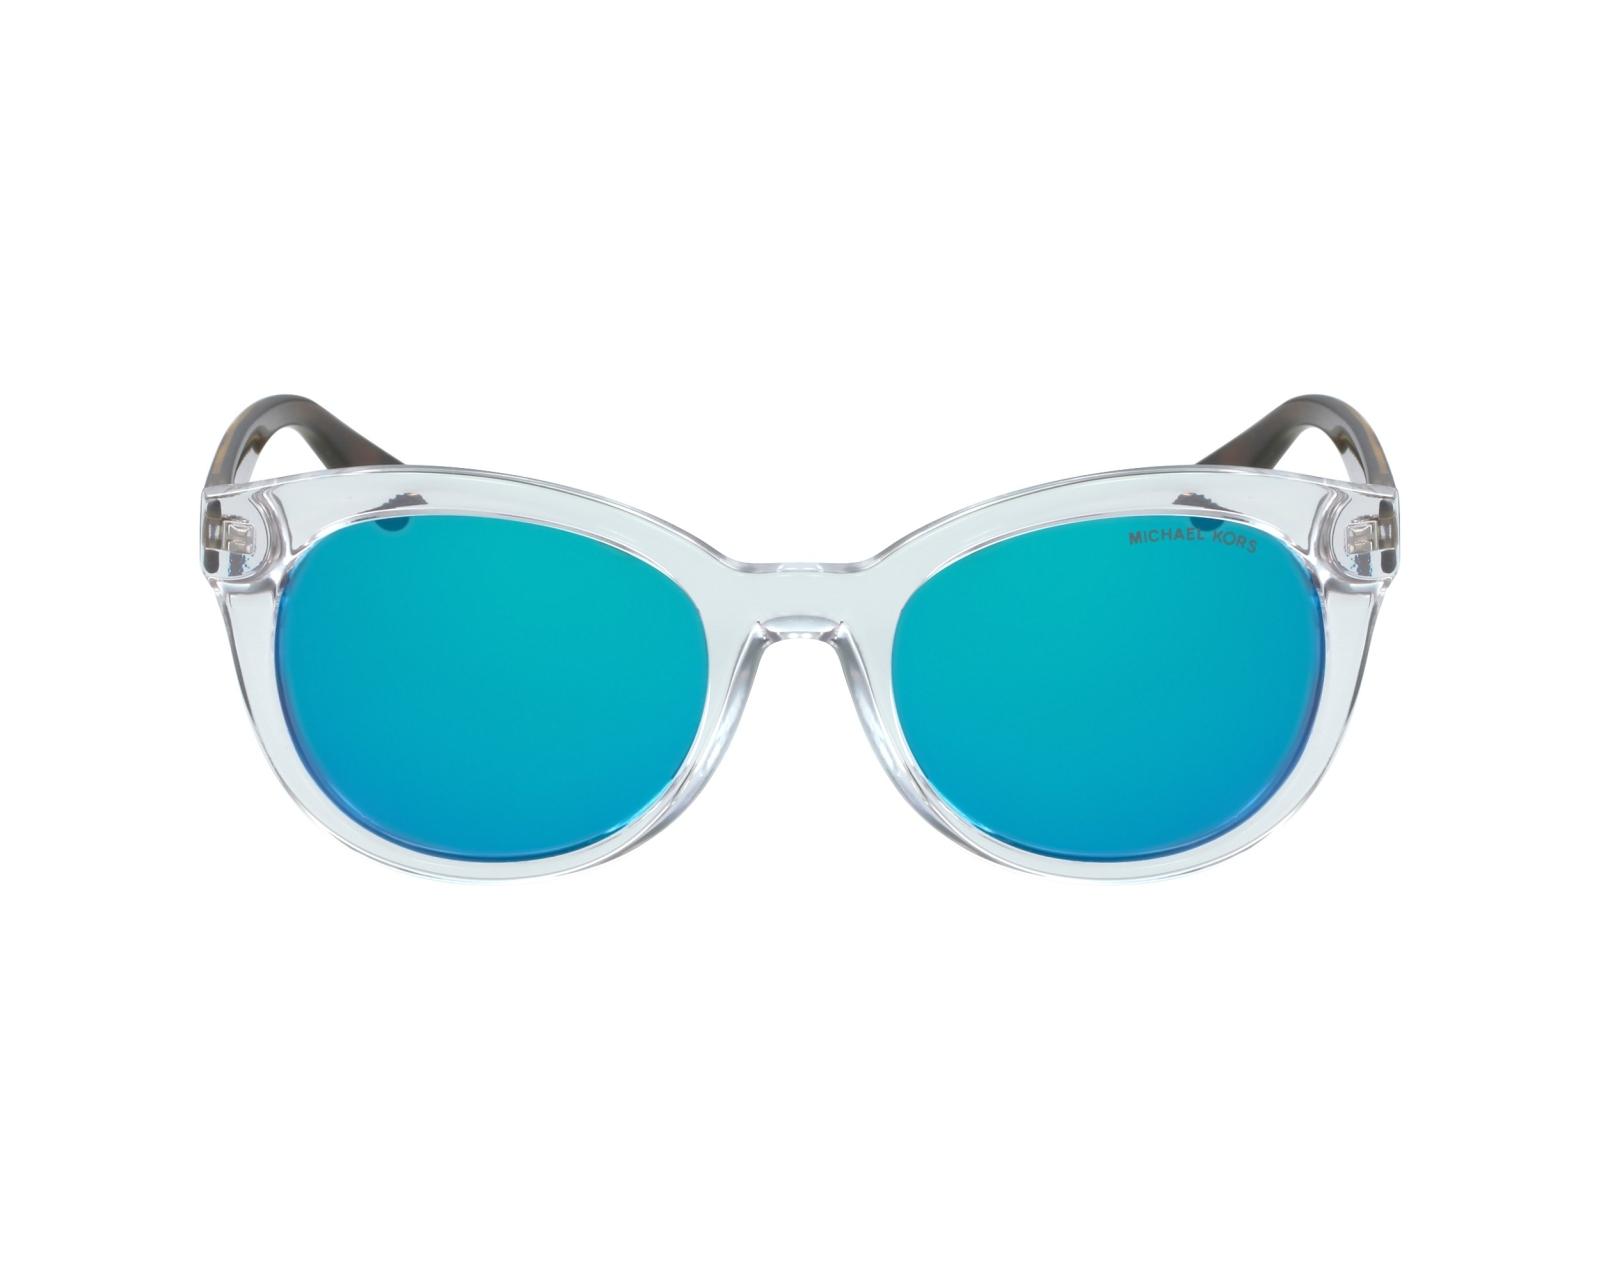 23c1338d8c5bf Sunglasses Michael Kors MK-6019 305025 - Crystal Havana profile view